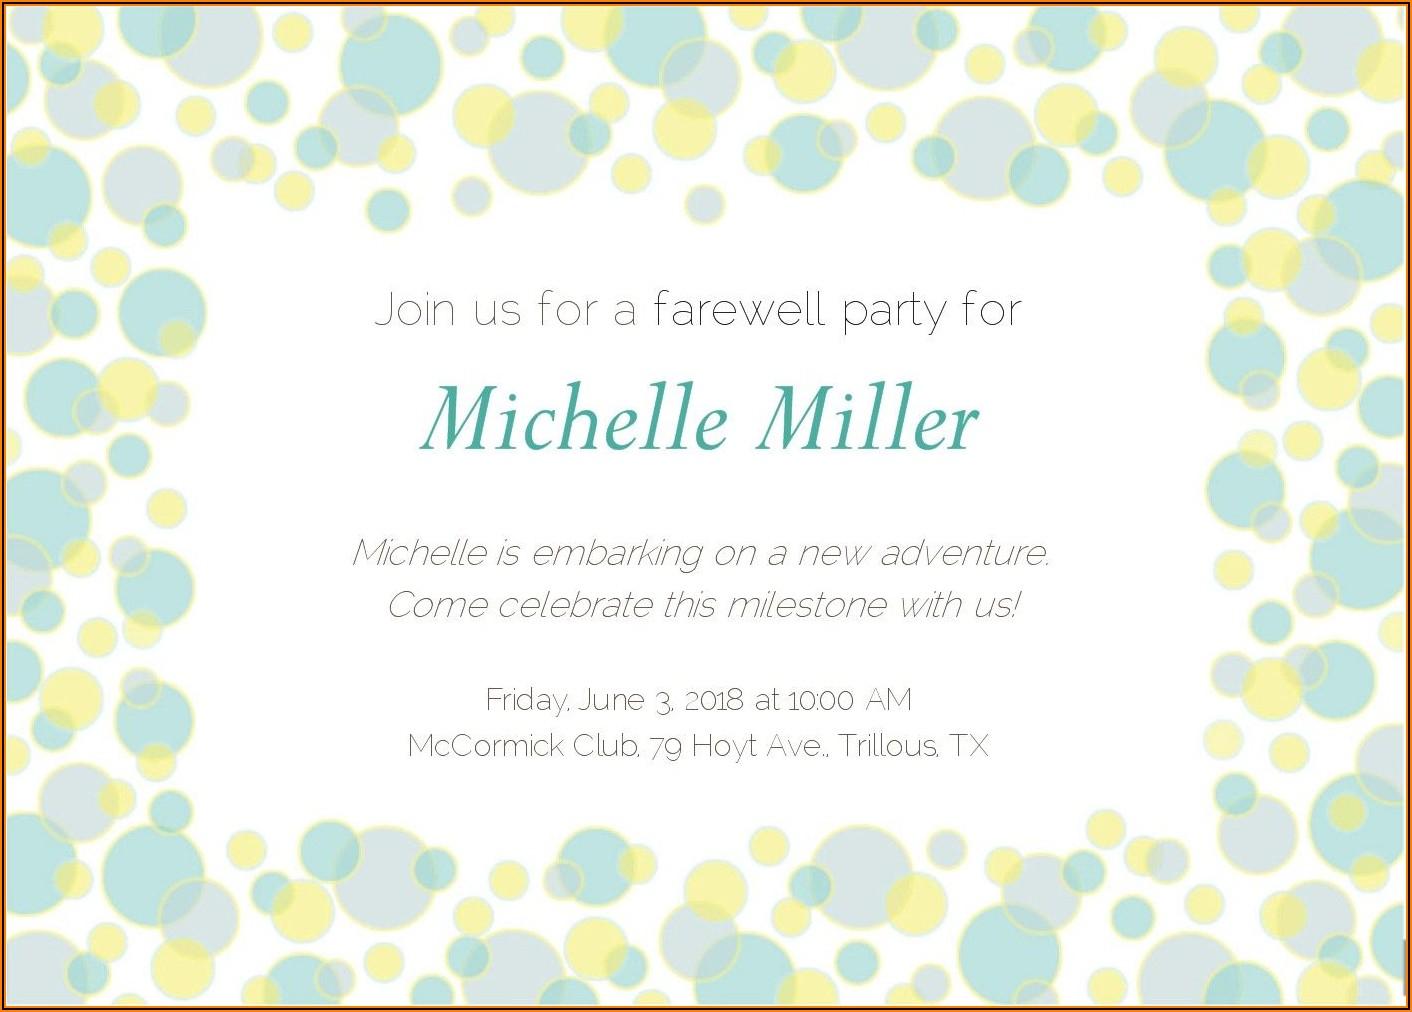 Farewell Dinner Invitation For Coworker